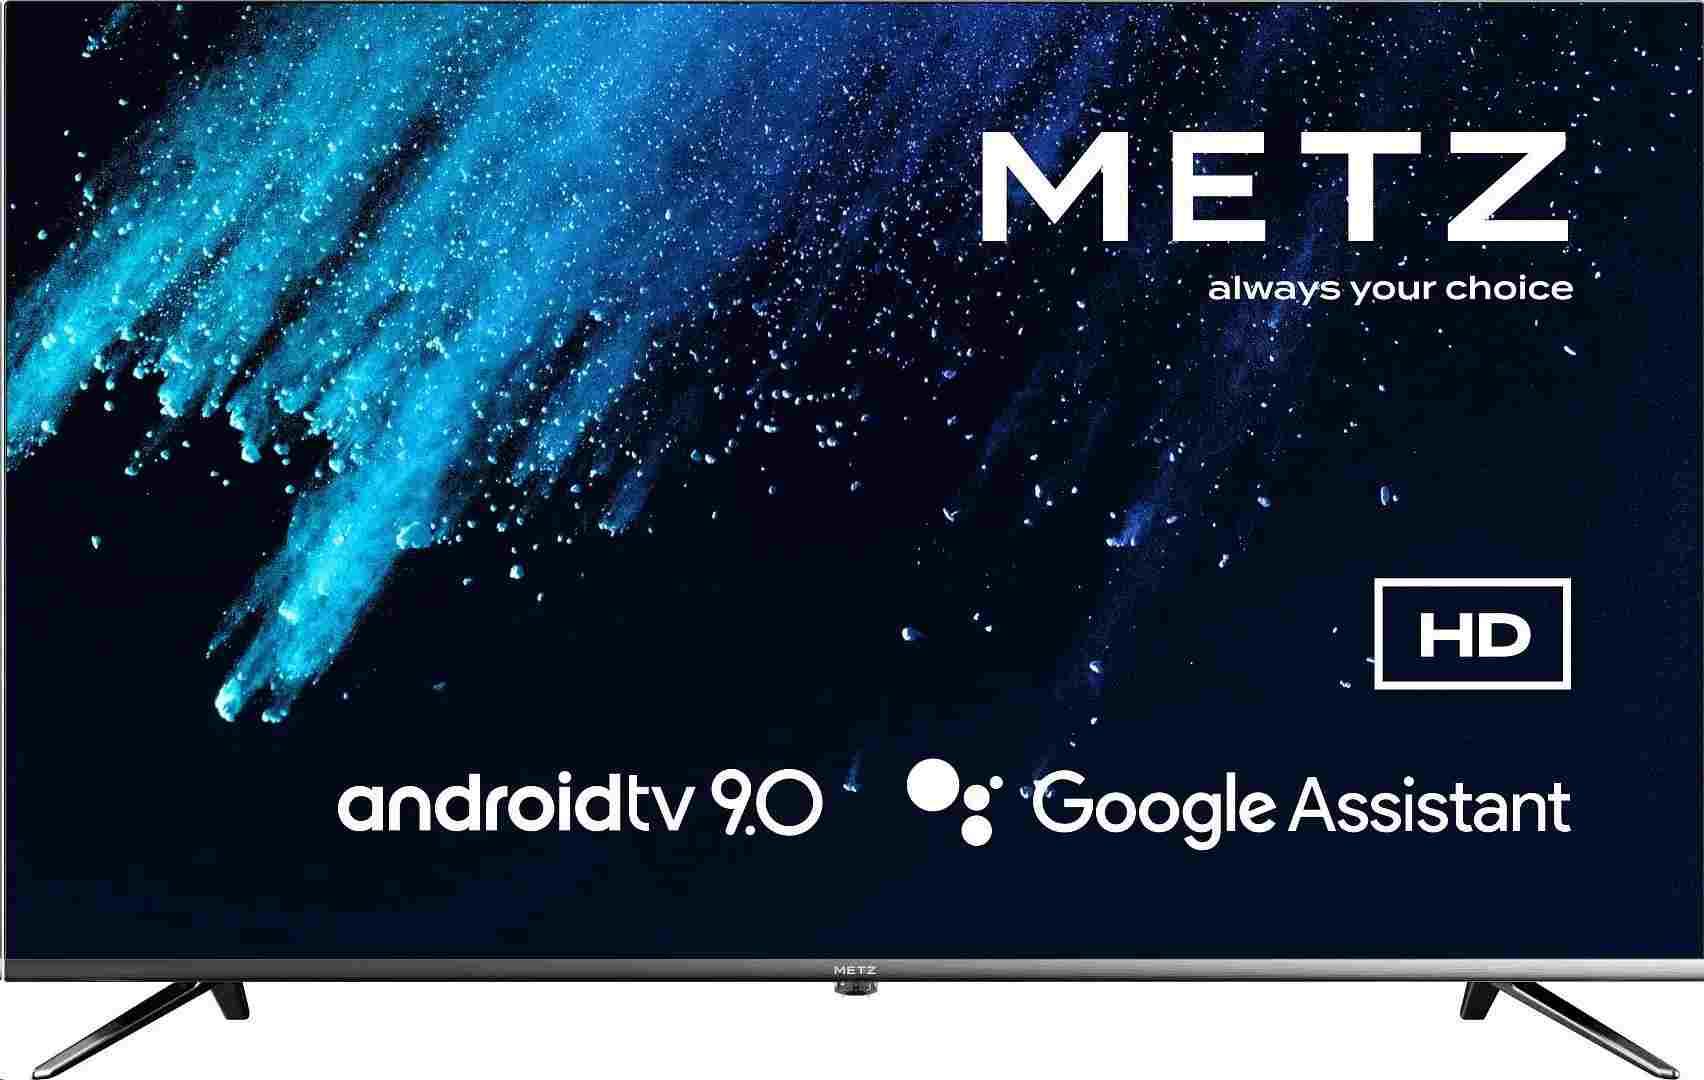 "METZ 32"" 32MTB7000Z, Android TV, LED, 81cm, HD (1366 x 768), 9ms, DVB-T2/S2/C, HDMI, USB"